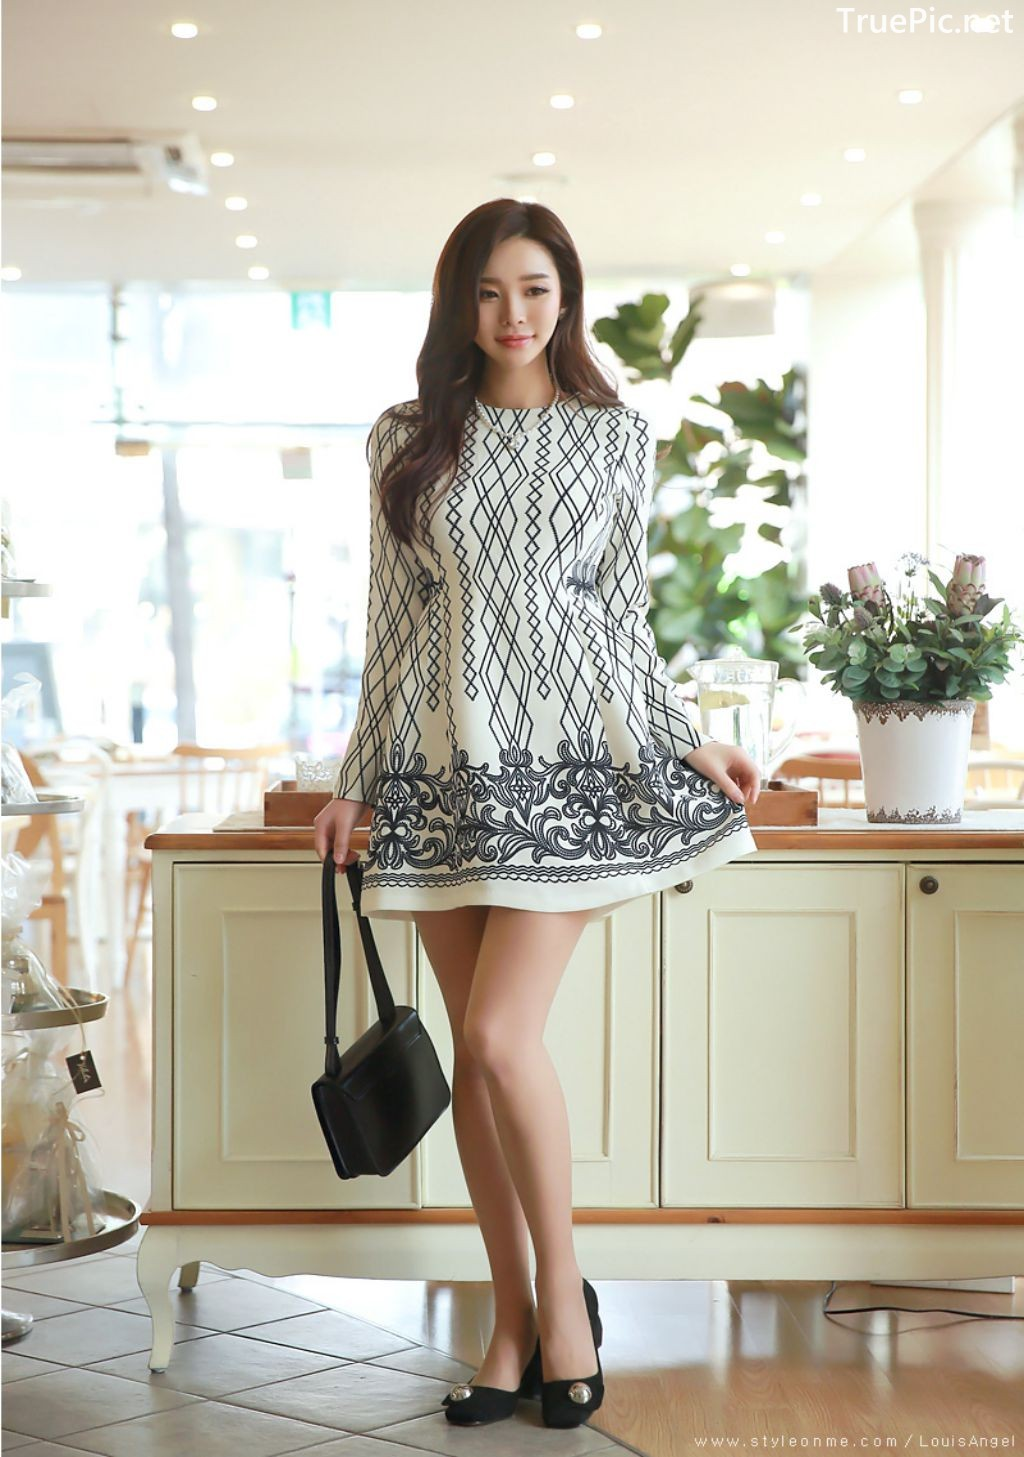 Image-Korean-Fashion-Model-Park-Da-Hyun-Office-Dress-Collection-TruePic.net- Picture-4